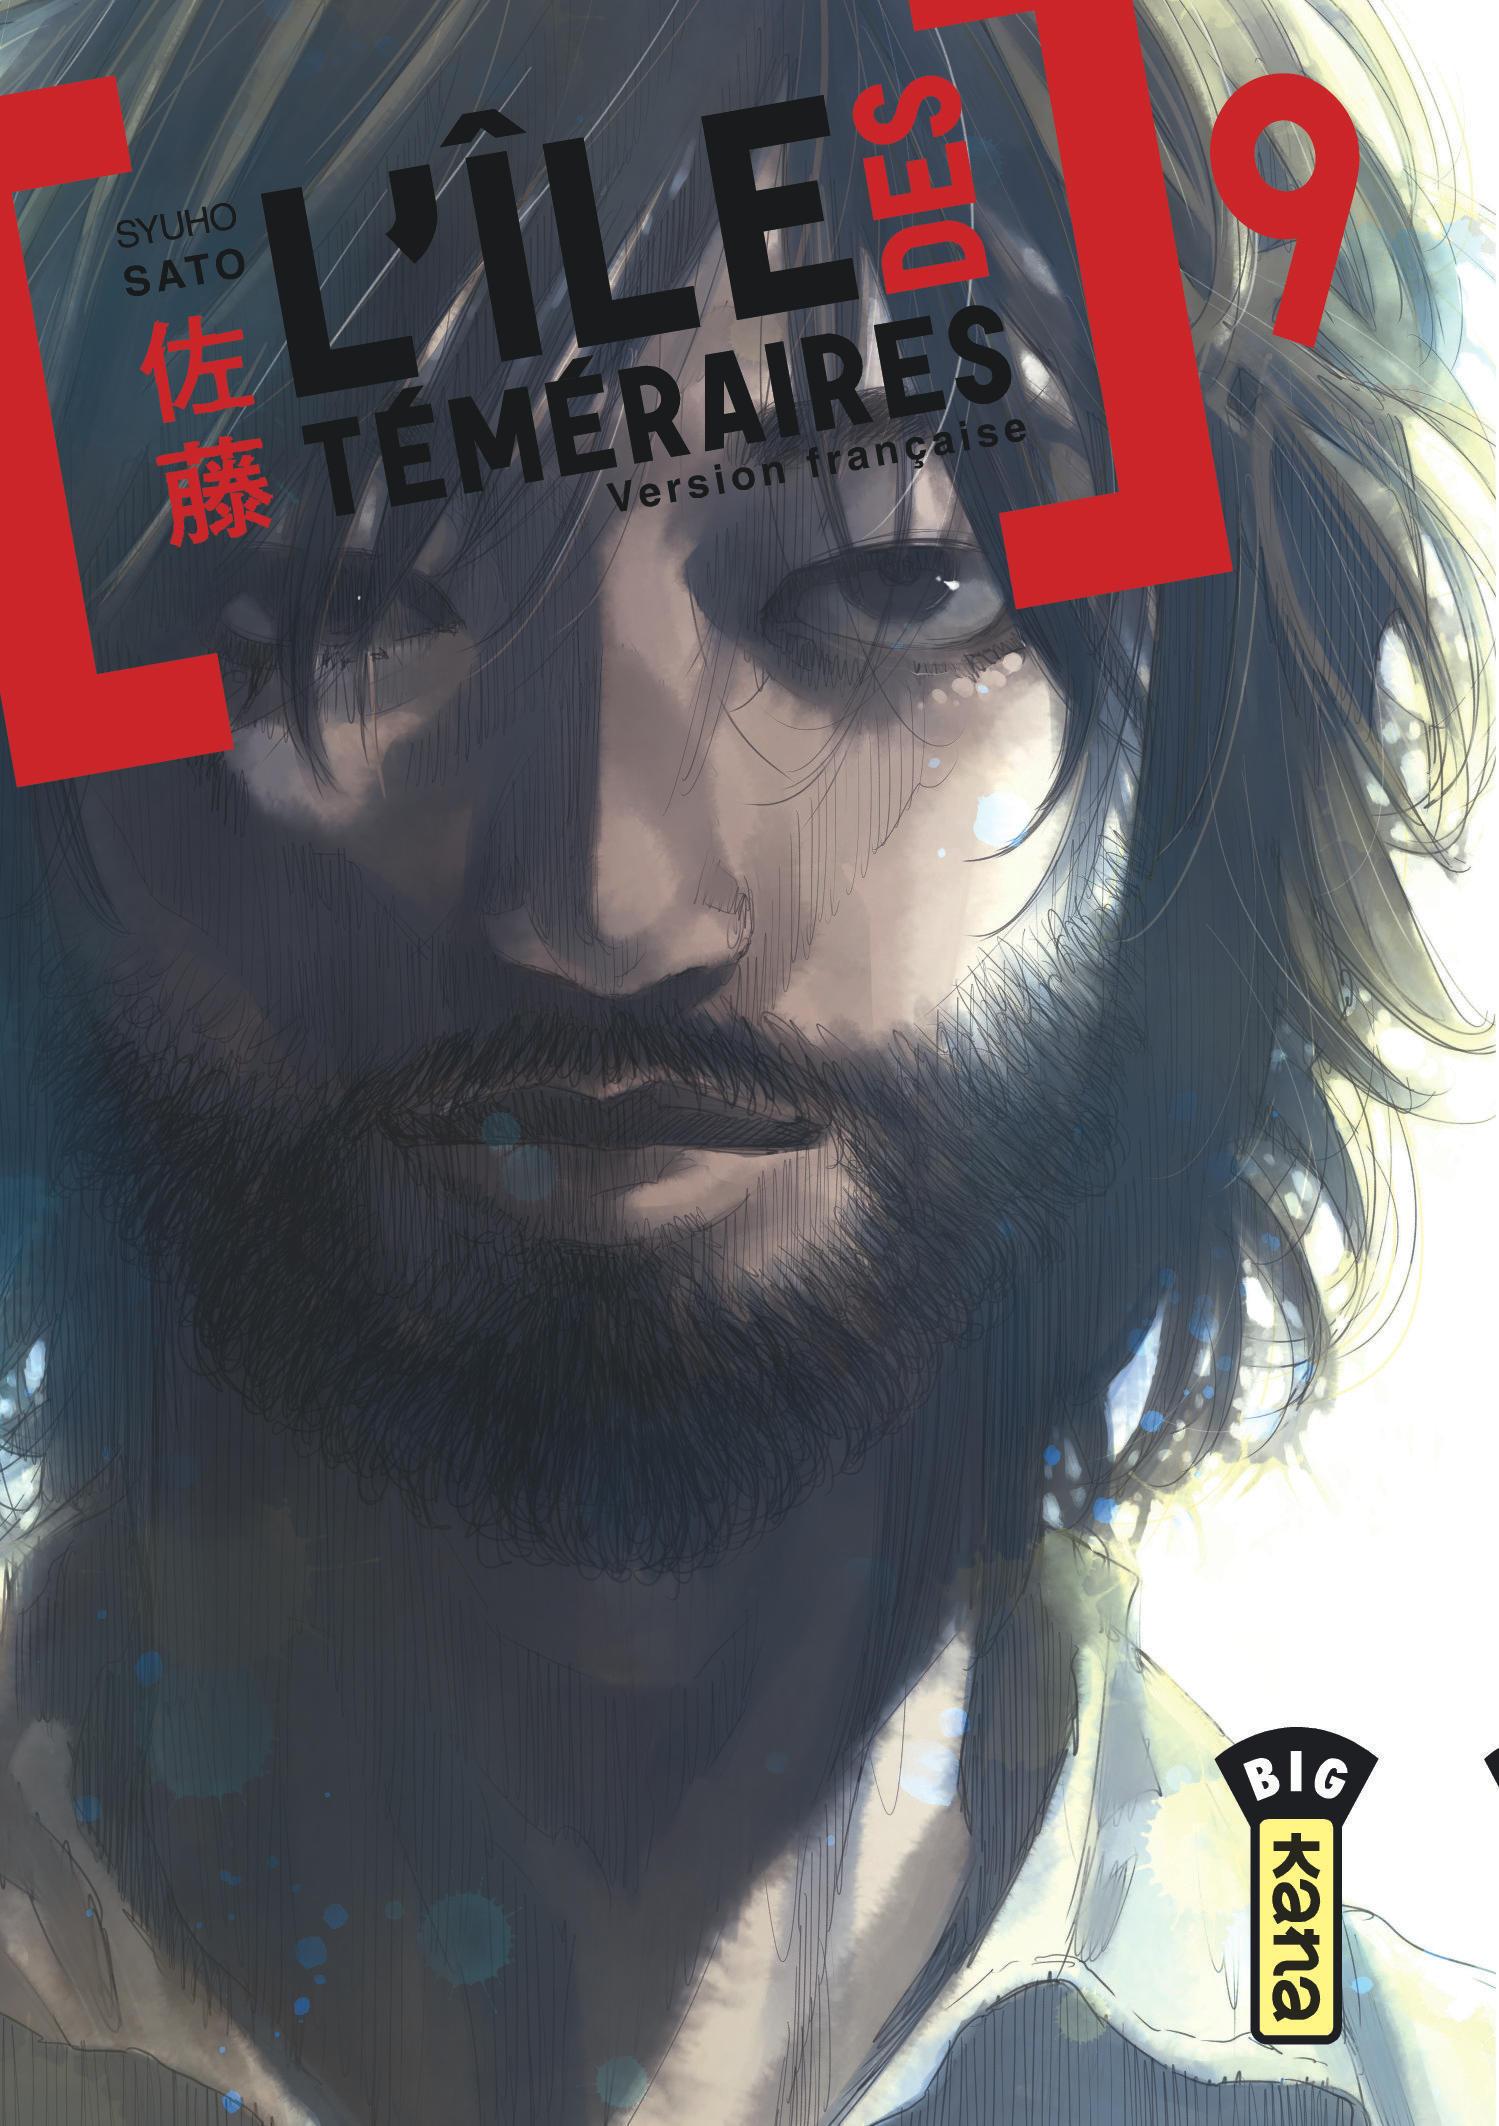 L'ILE DES TEMERAIRES, TOME 9